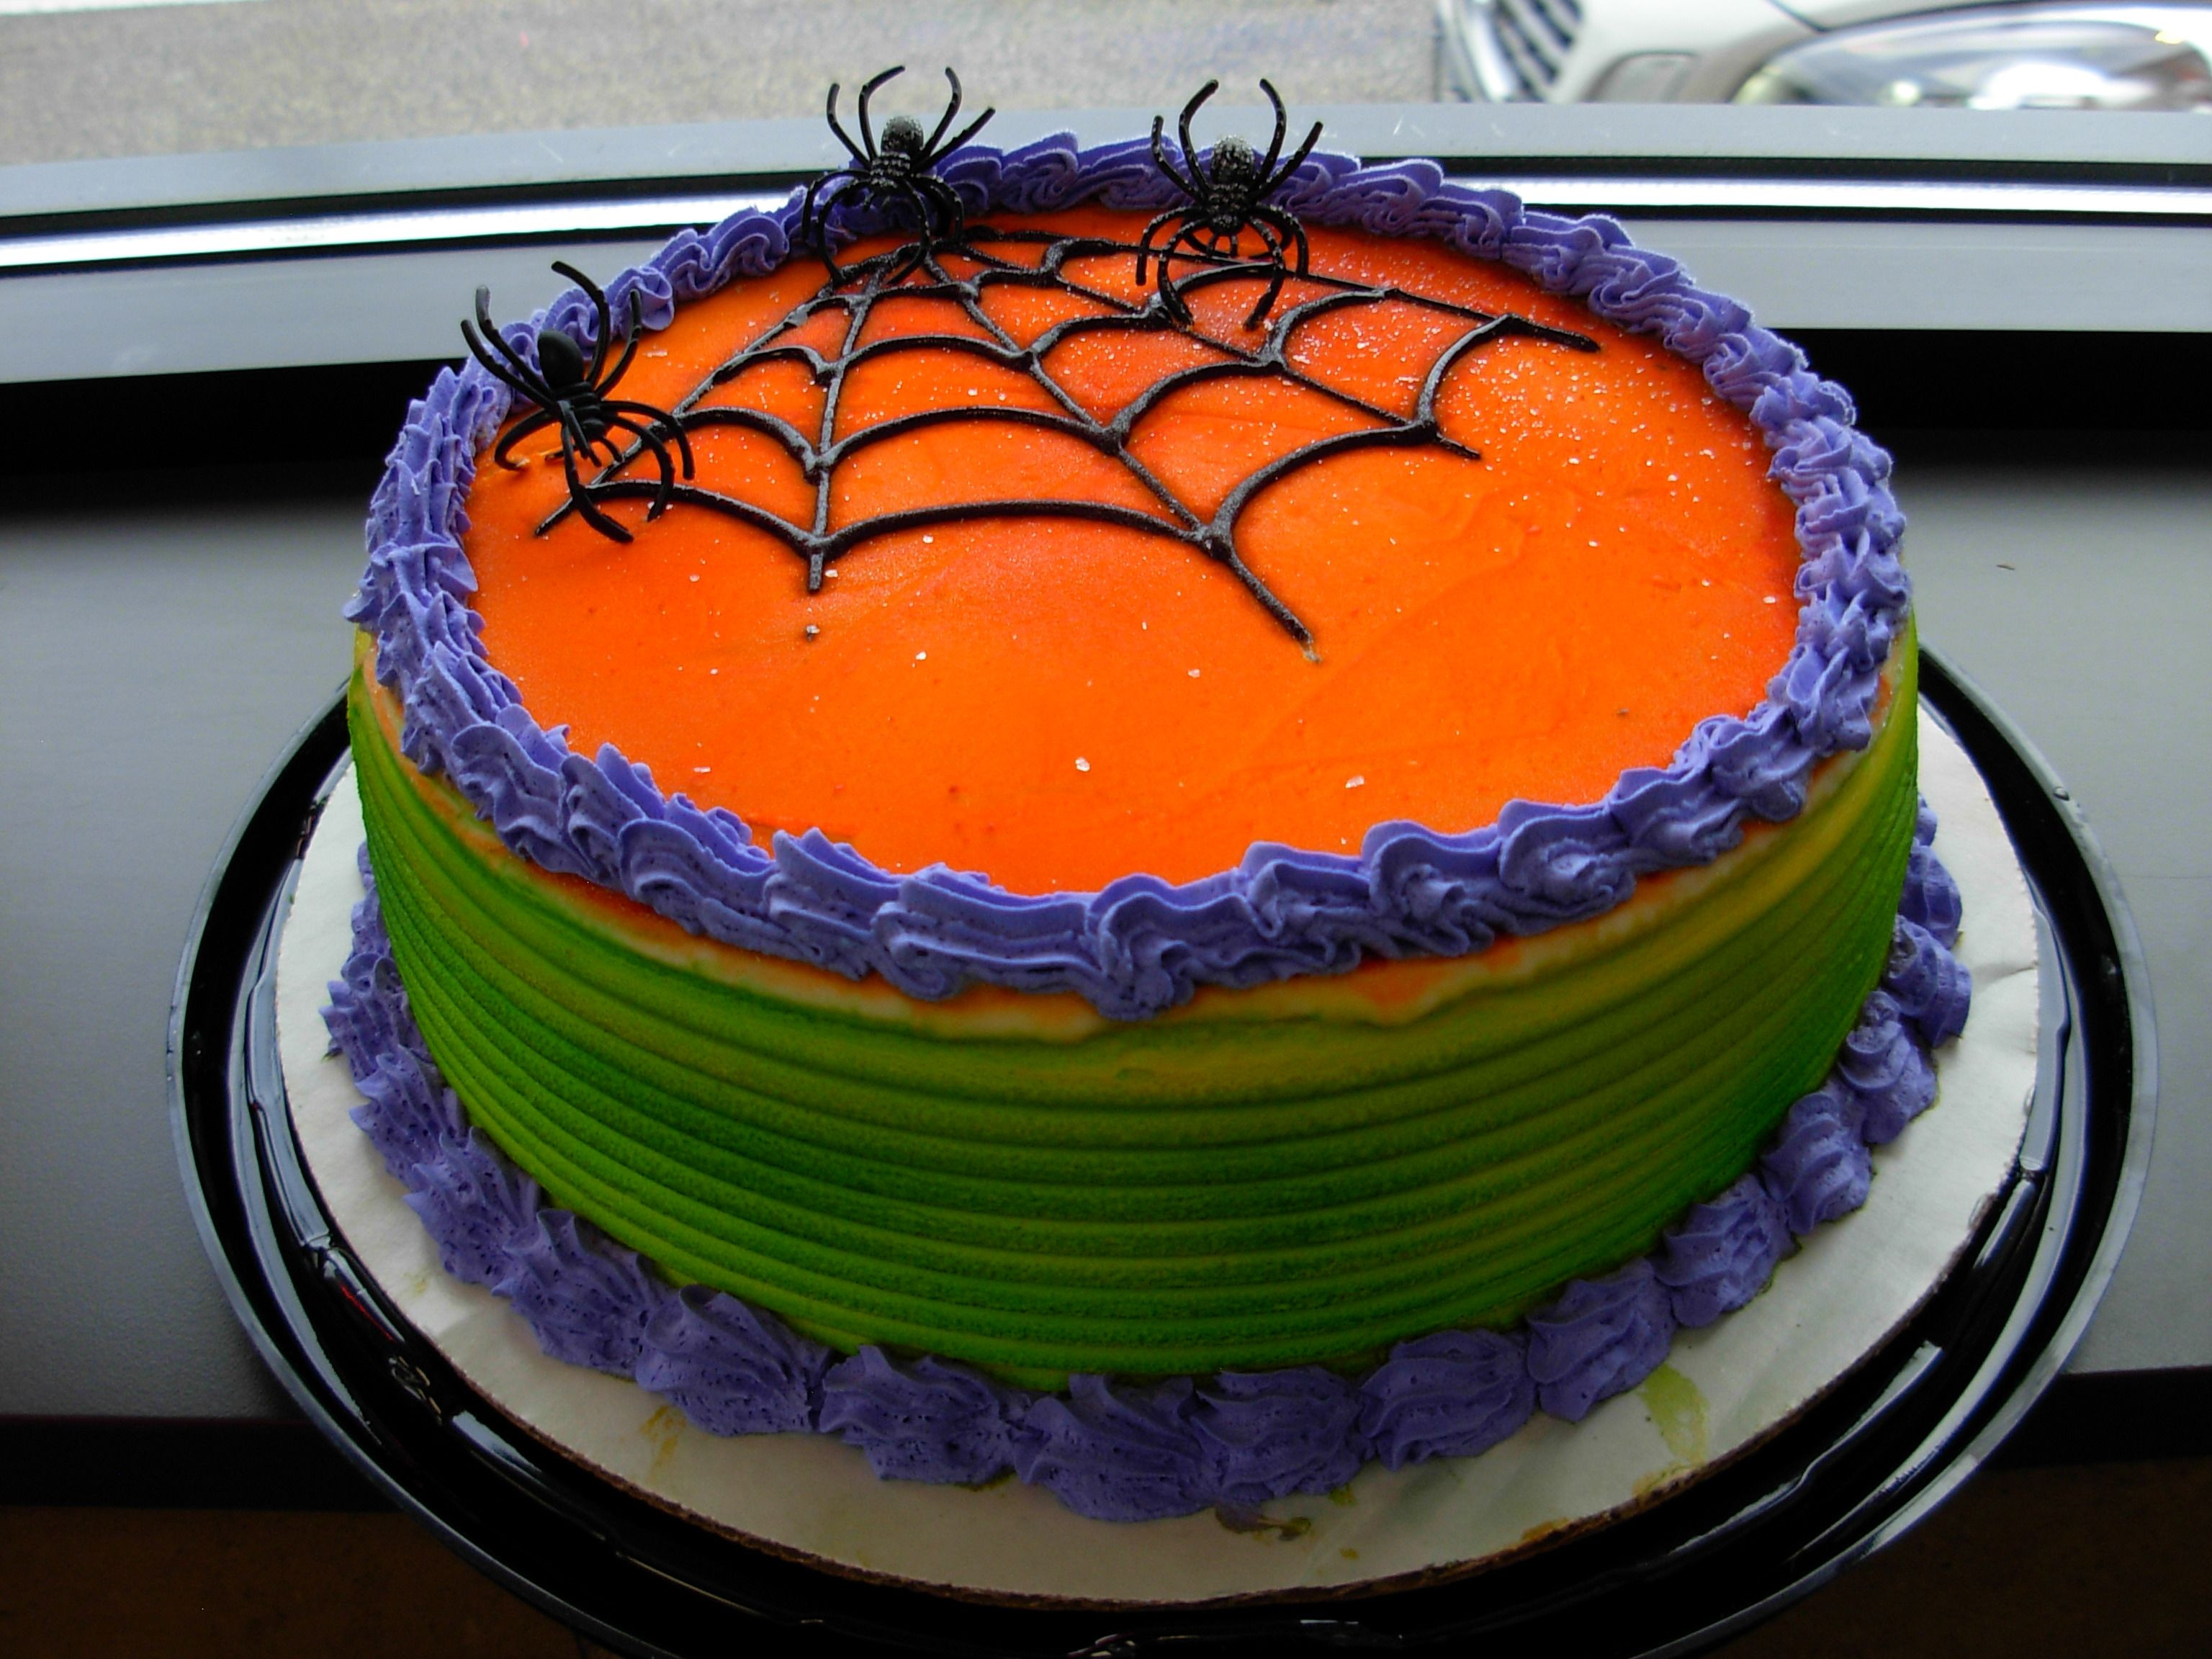 Halloween Cakes At Walmart  Halloween Web DQ Dairy Queen Ice Cream Cake